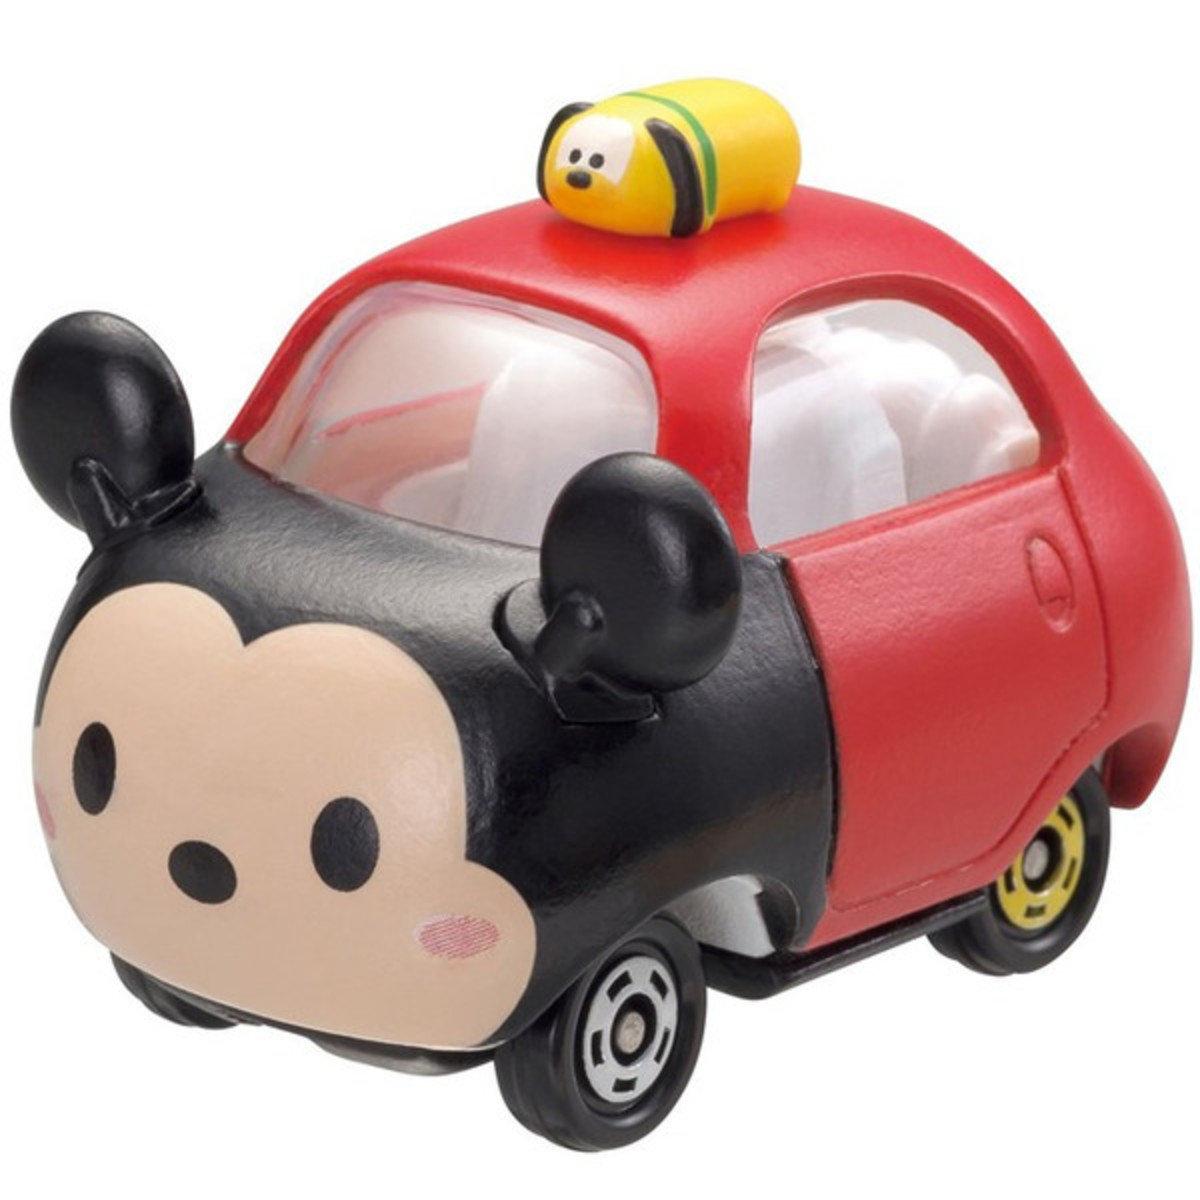 Disney Motors DMT-01 Tsum Tsum Mickey Mouse